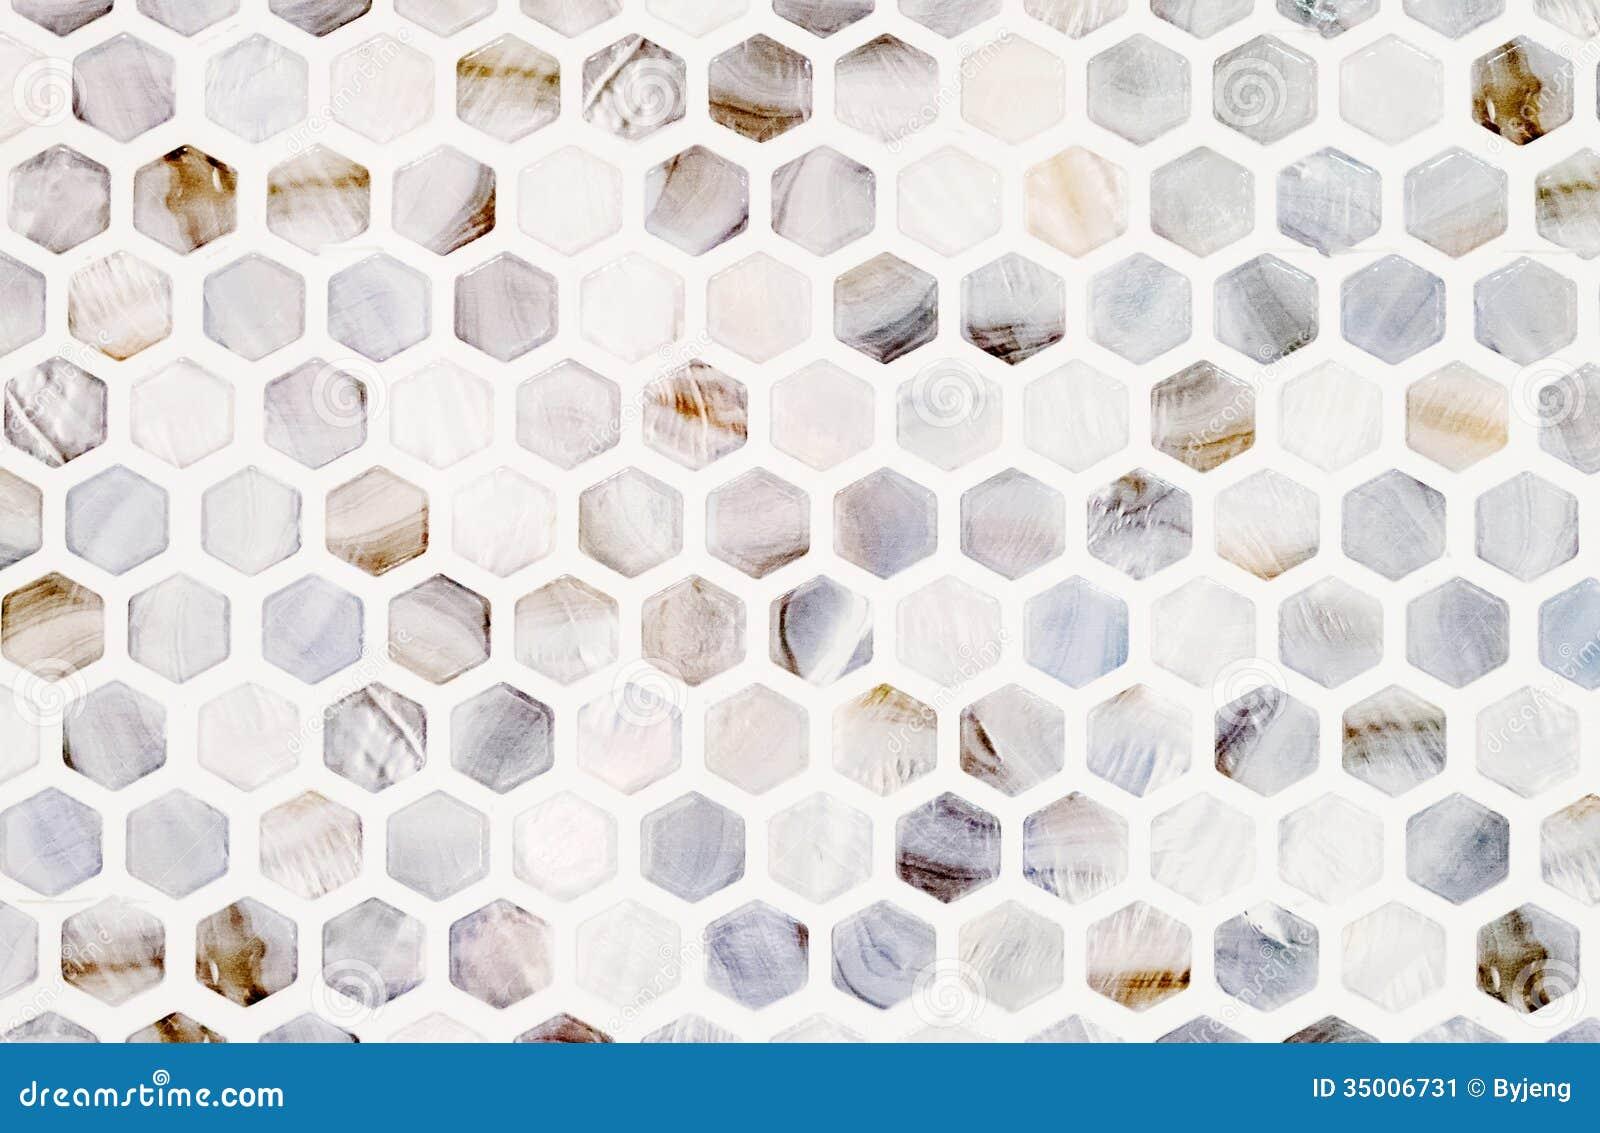 Download Ceramic tile mosaic stock image. Image of detail, indoor - 35006731